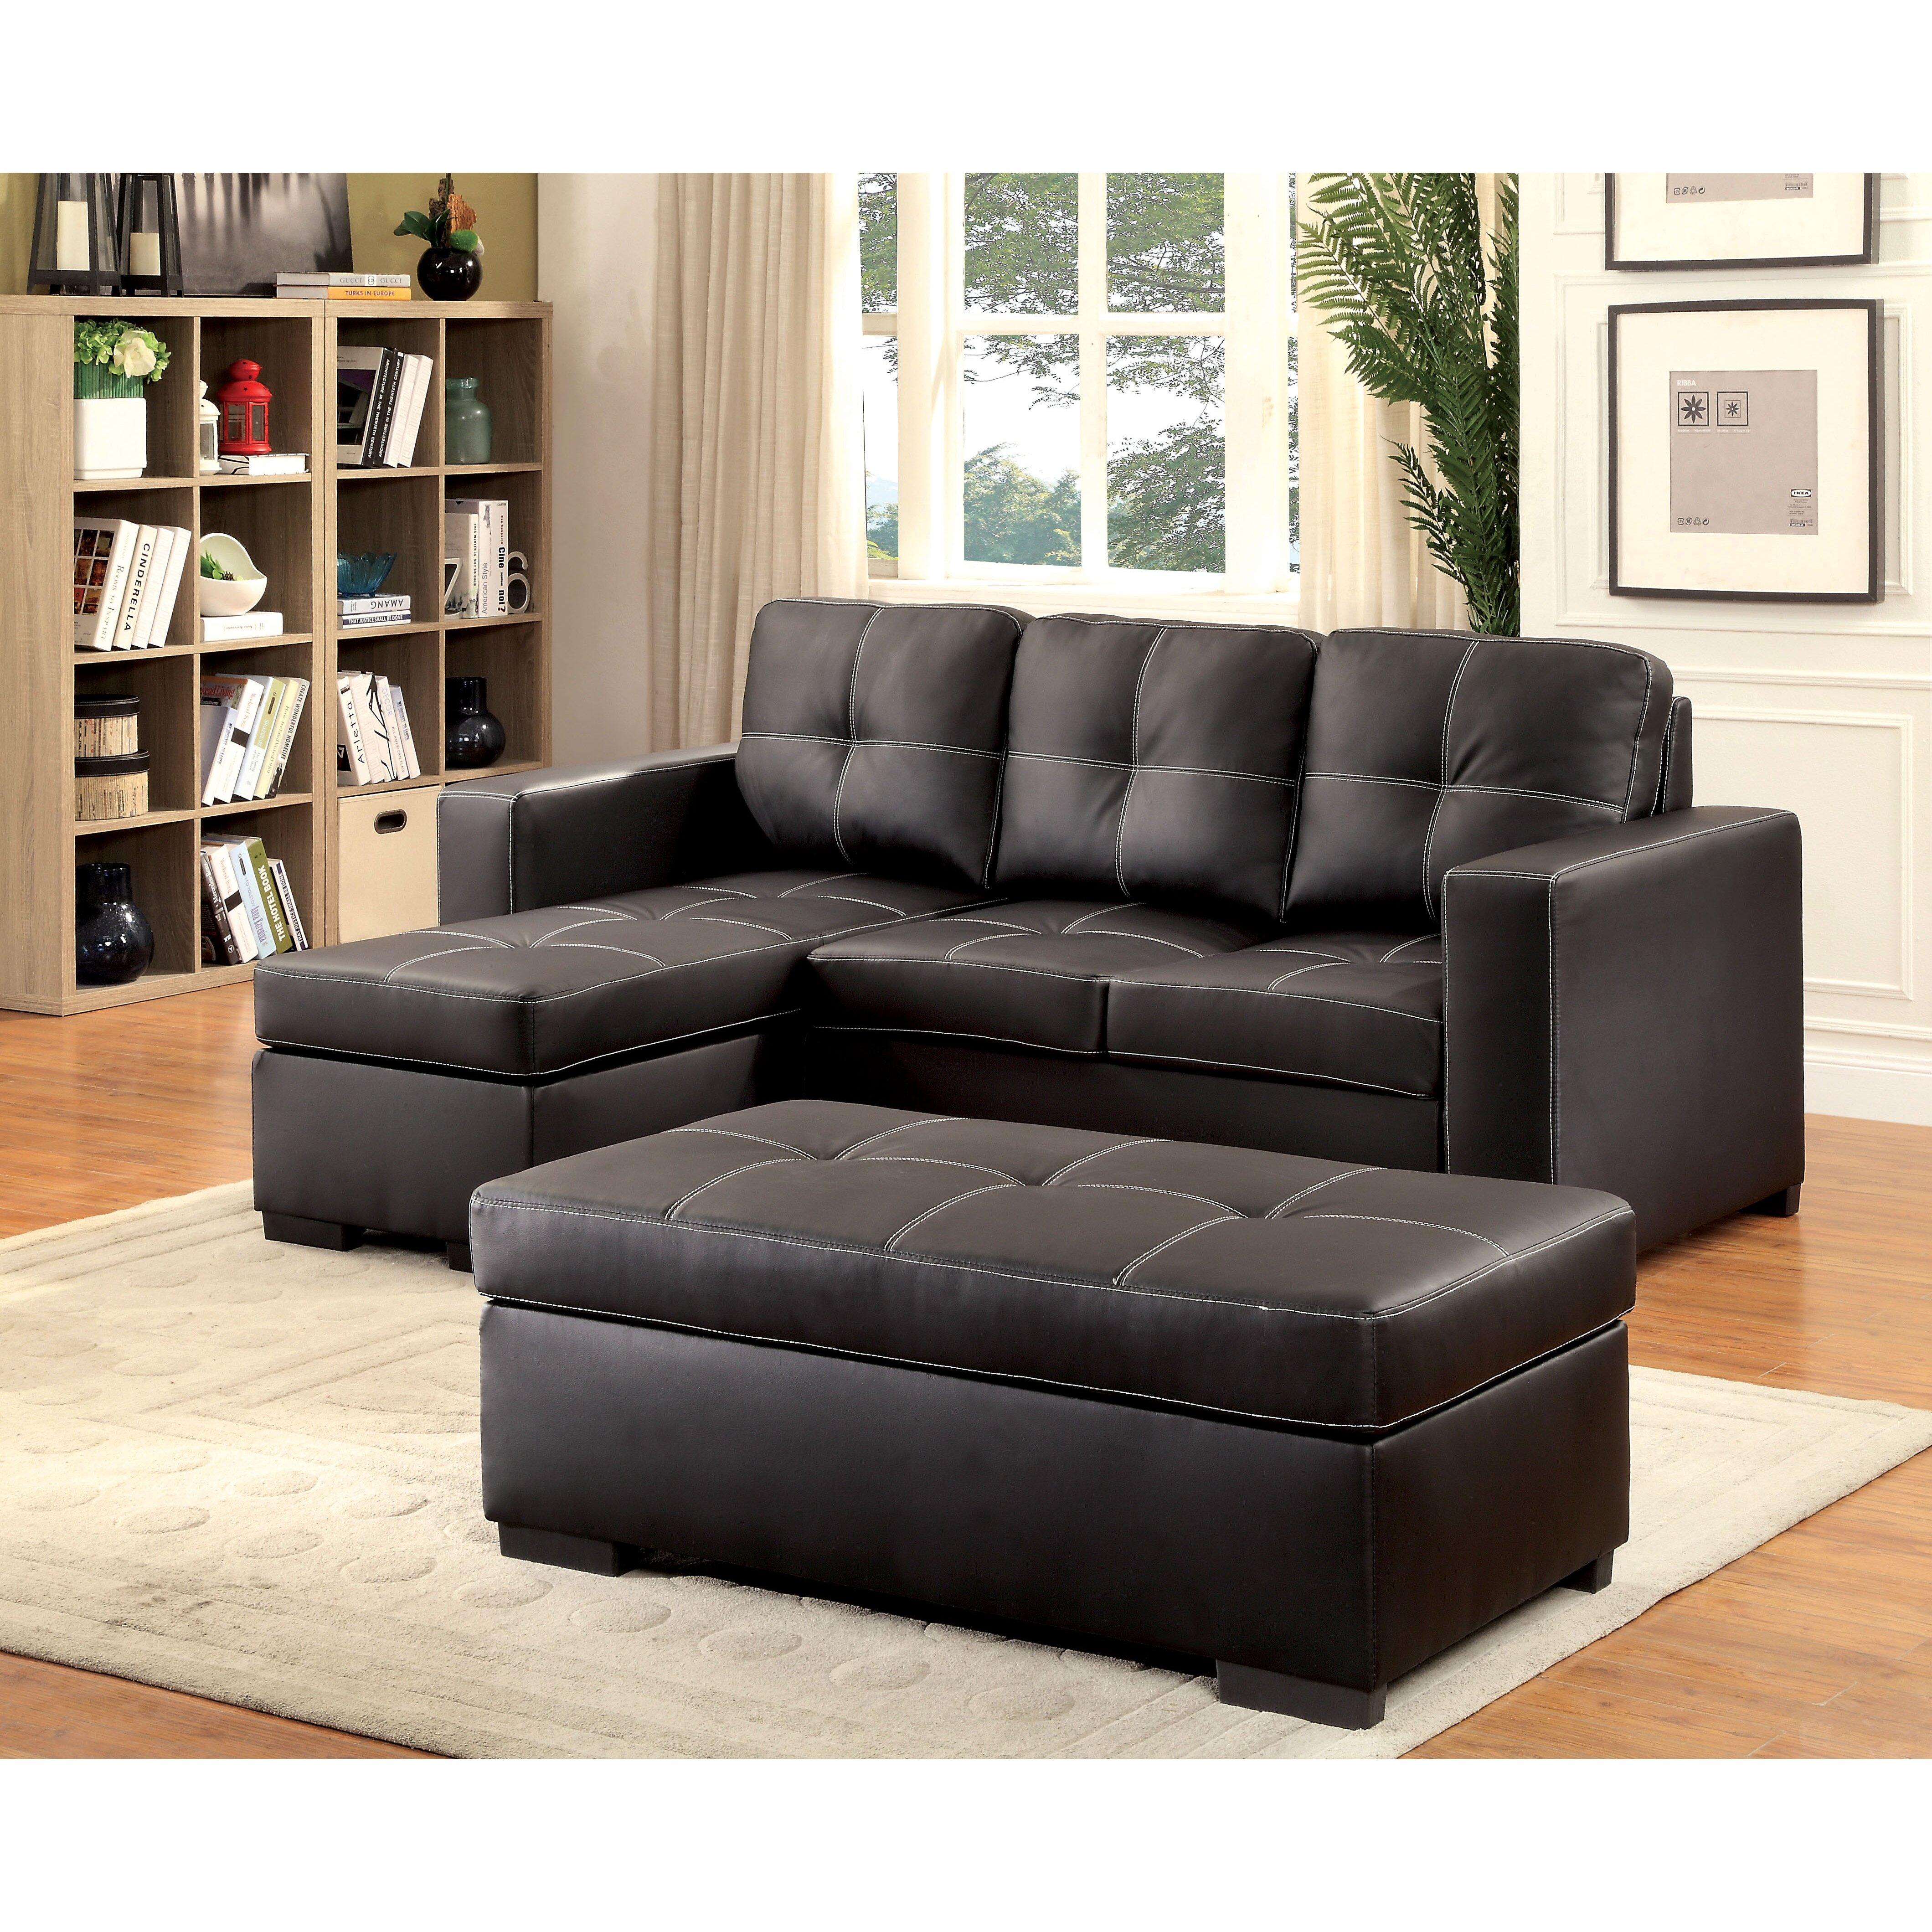 Latitude run ohboke reversible chaise sectional wayfair for Sectional sofa reversible chaise living room furniture